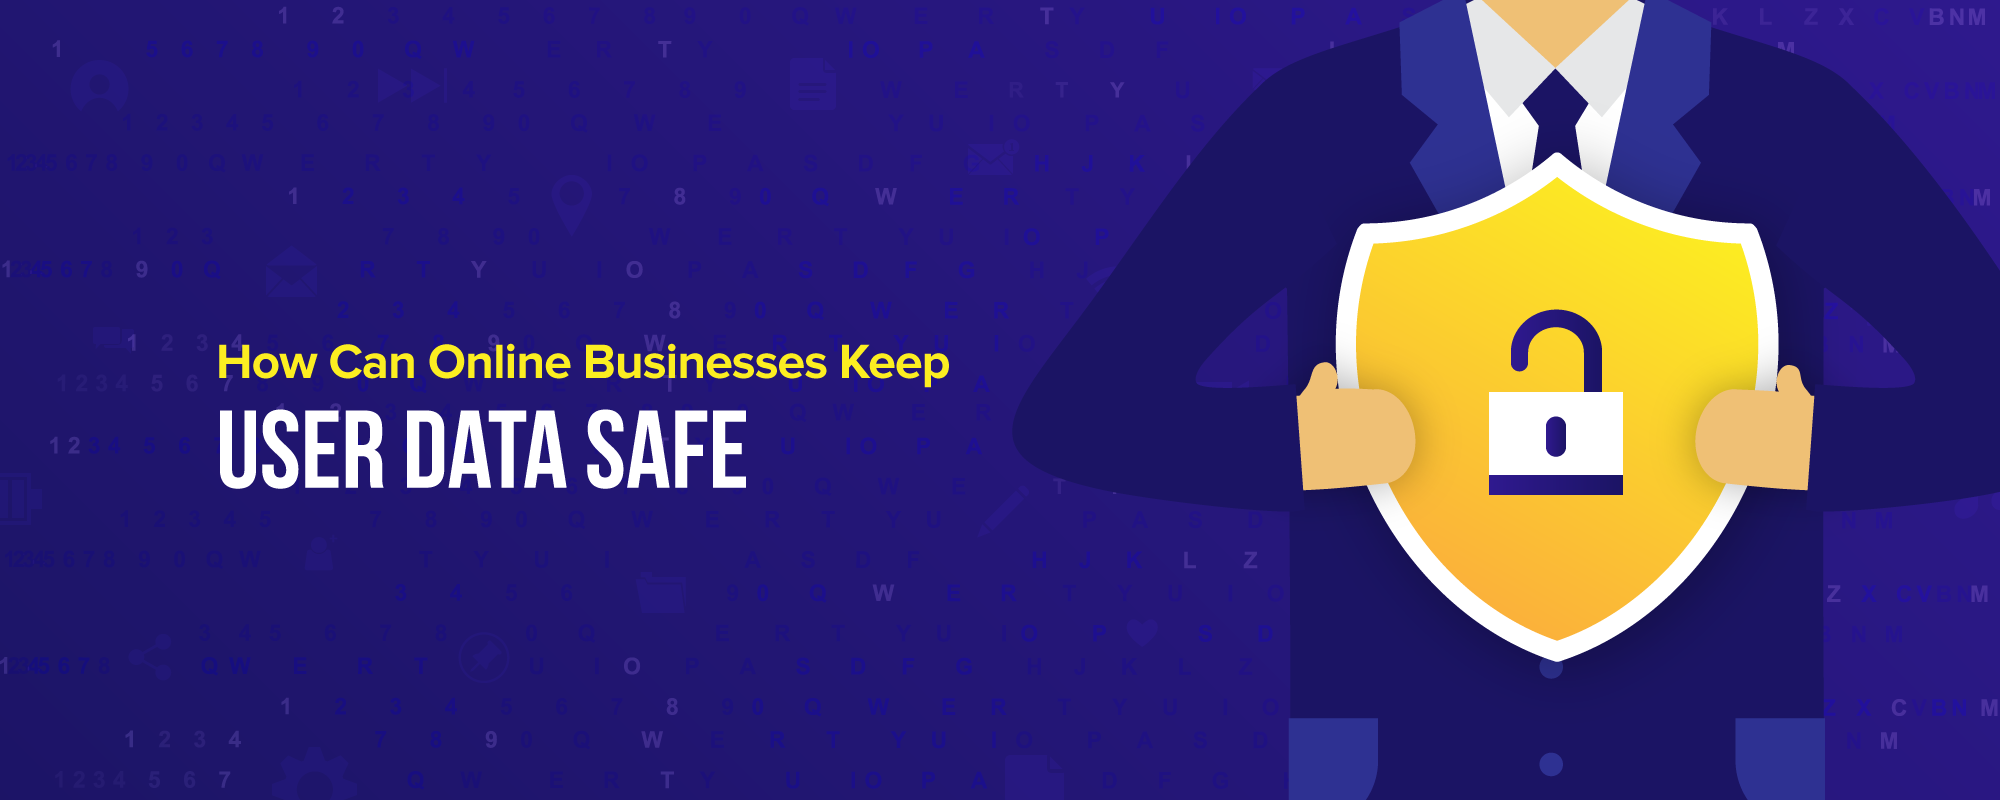 Security Measures Online Businesses Should Take to Keep User Data Safe